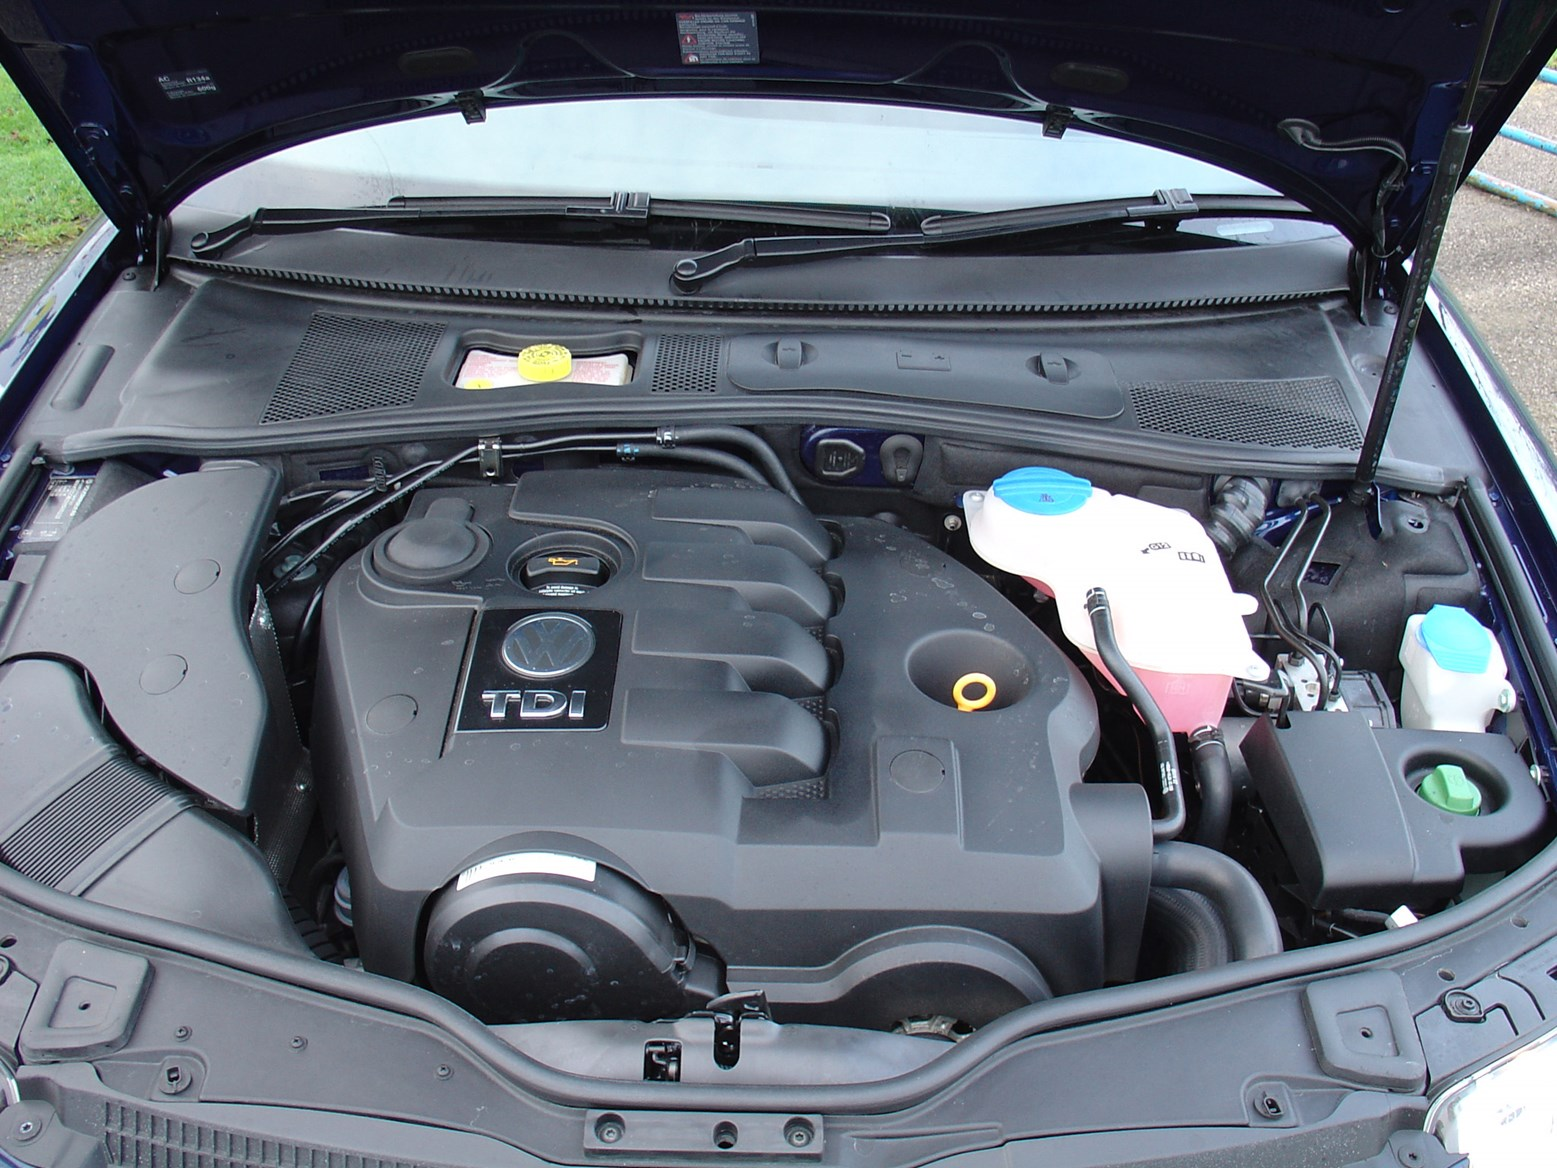 VW vw passat 2001 : Volkswagen Passat Estate Review (2000 - 2005) | Parkers